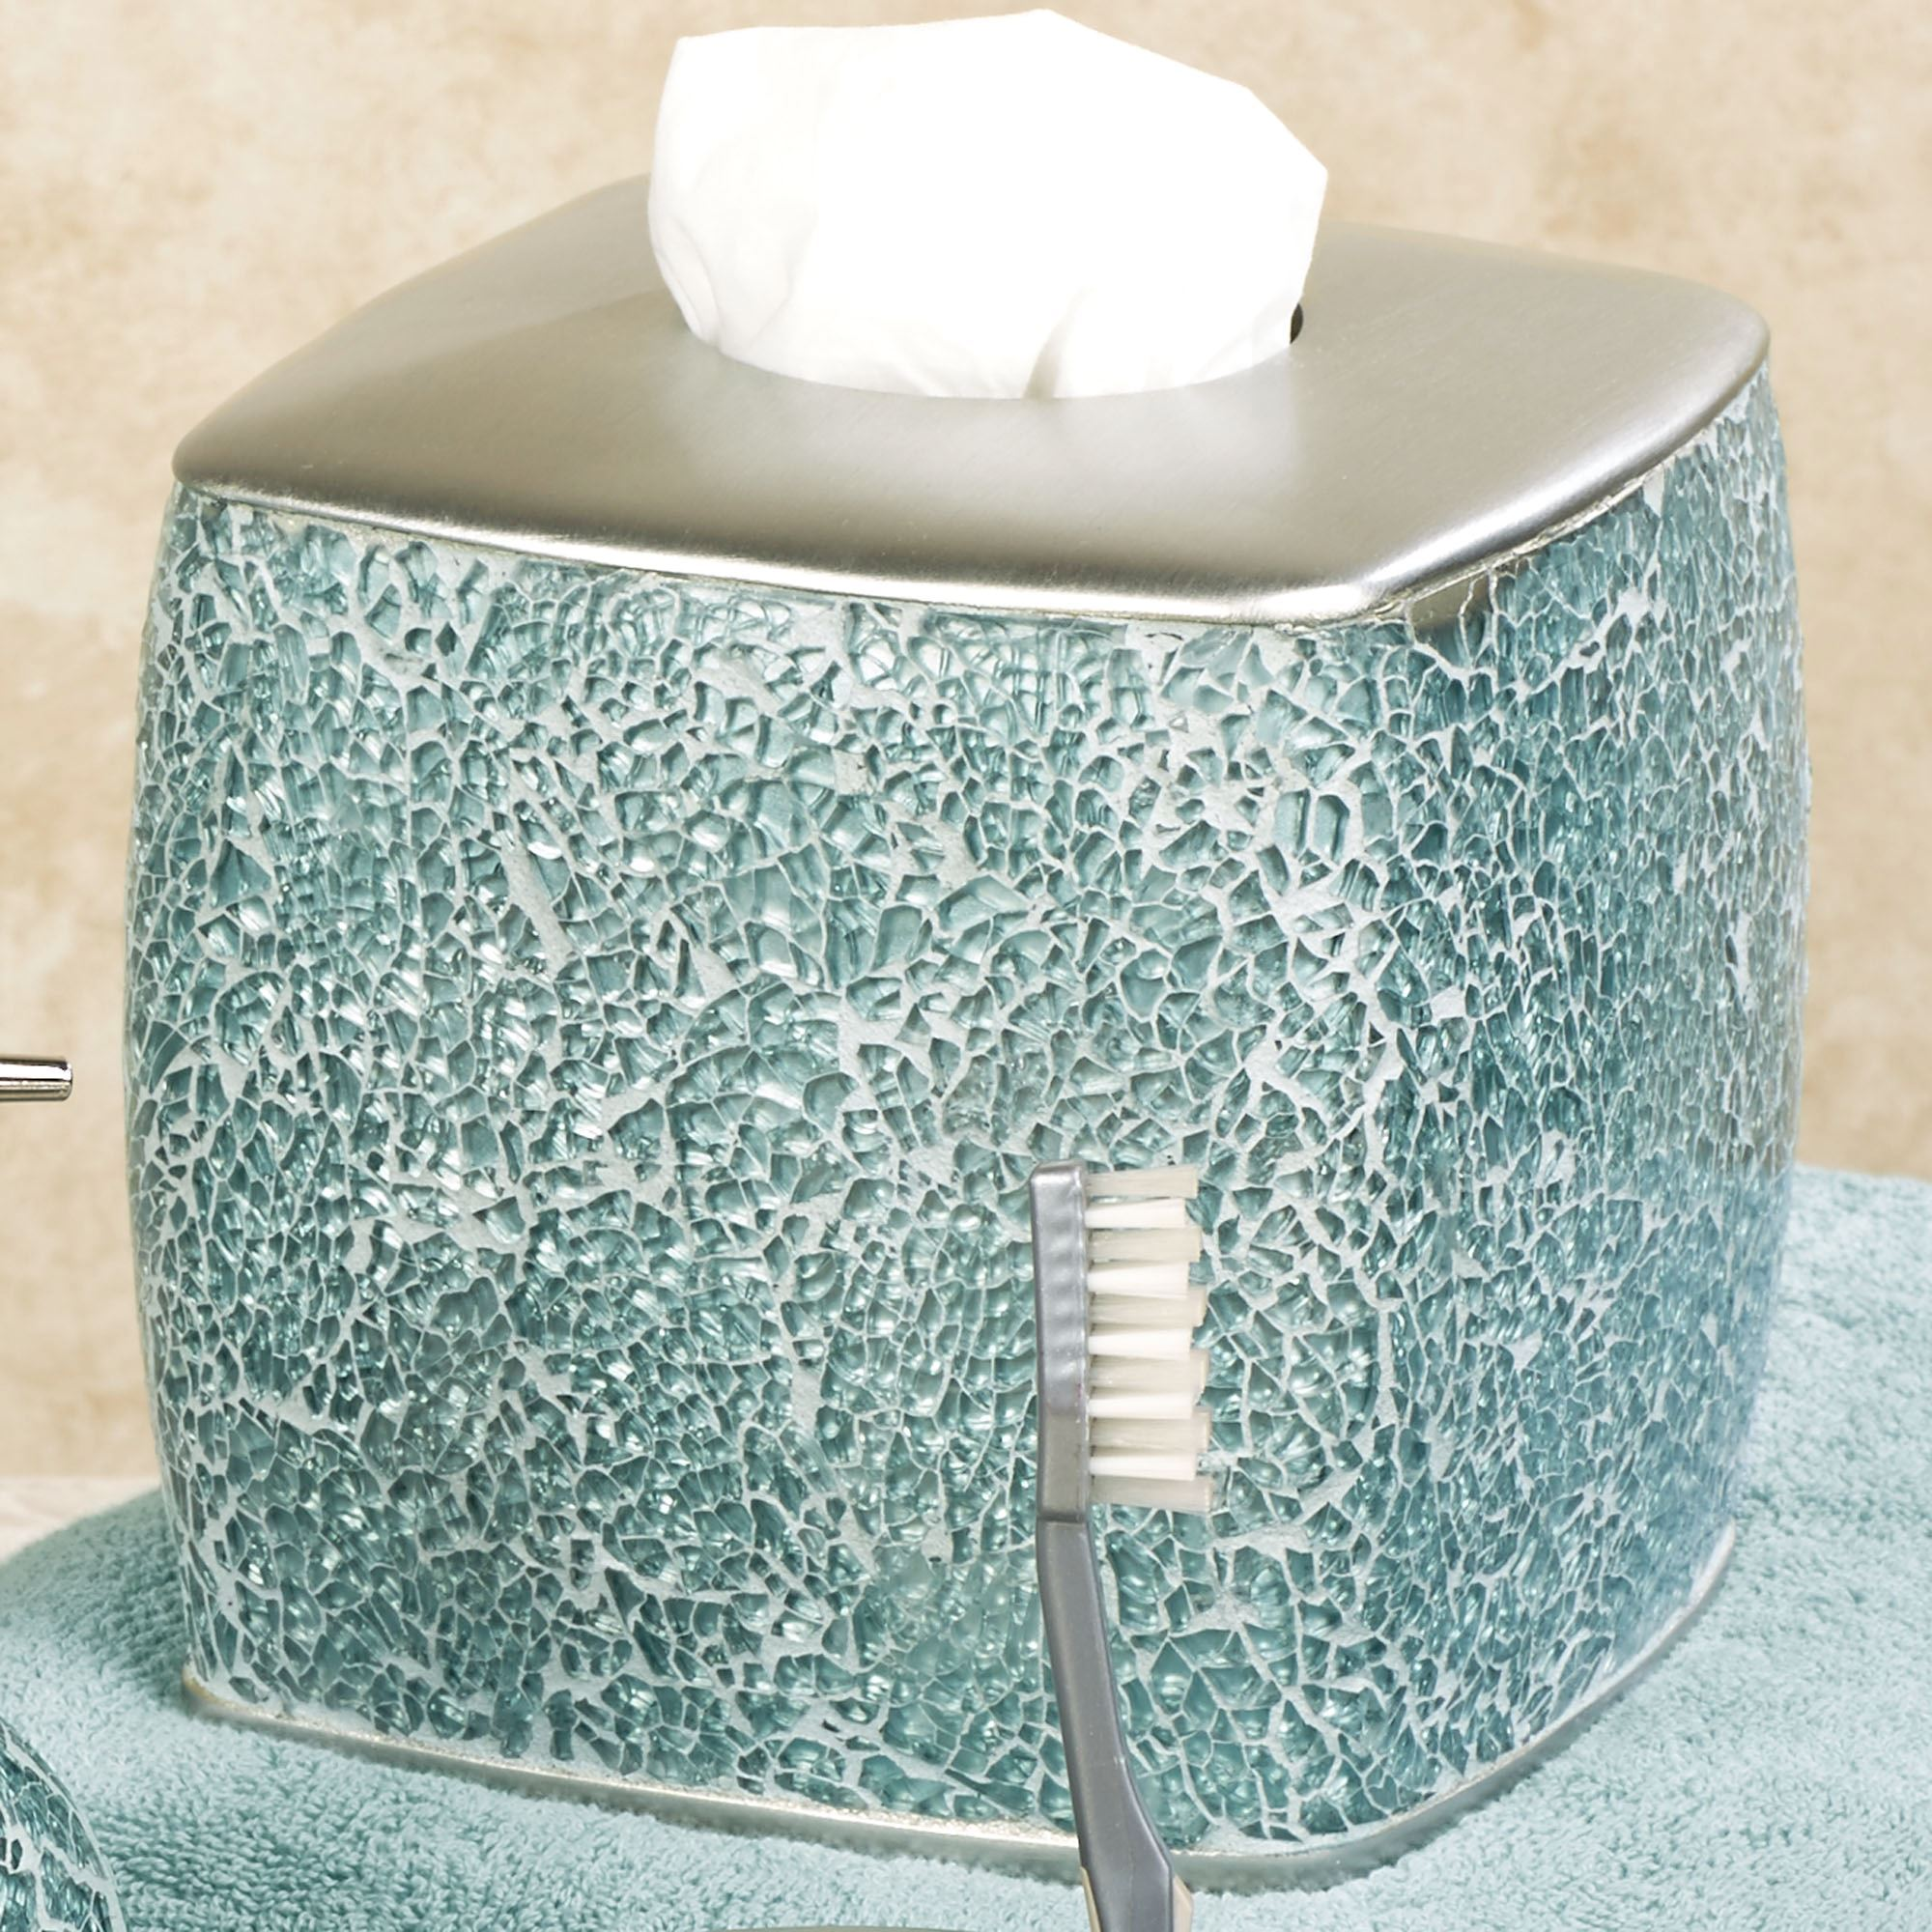 Calm Waters Light Aqua Mosaic Bath Accessories